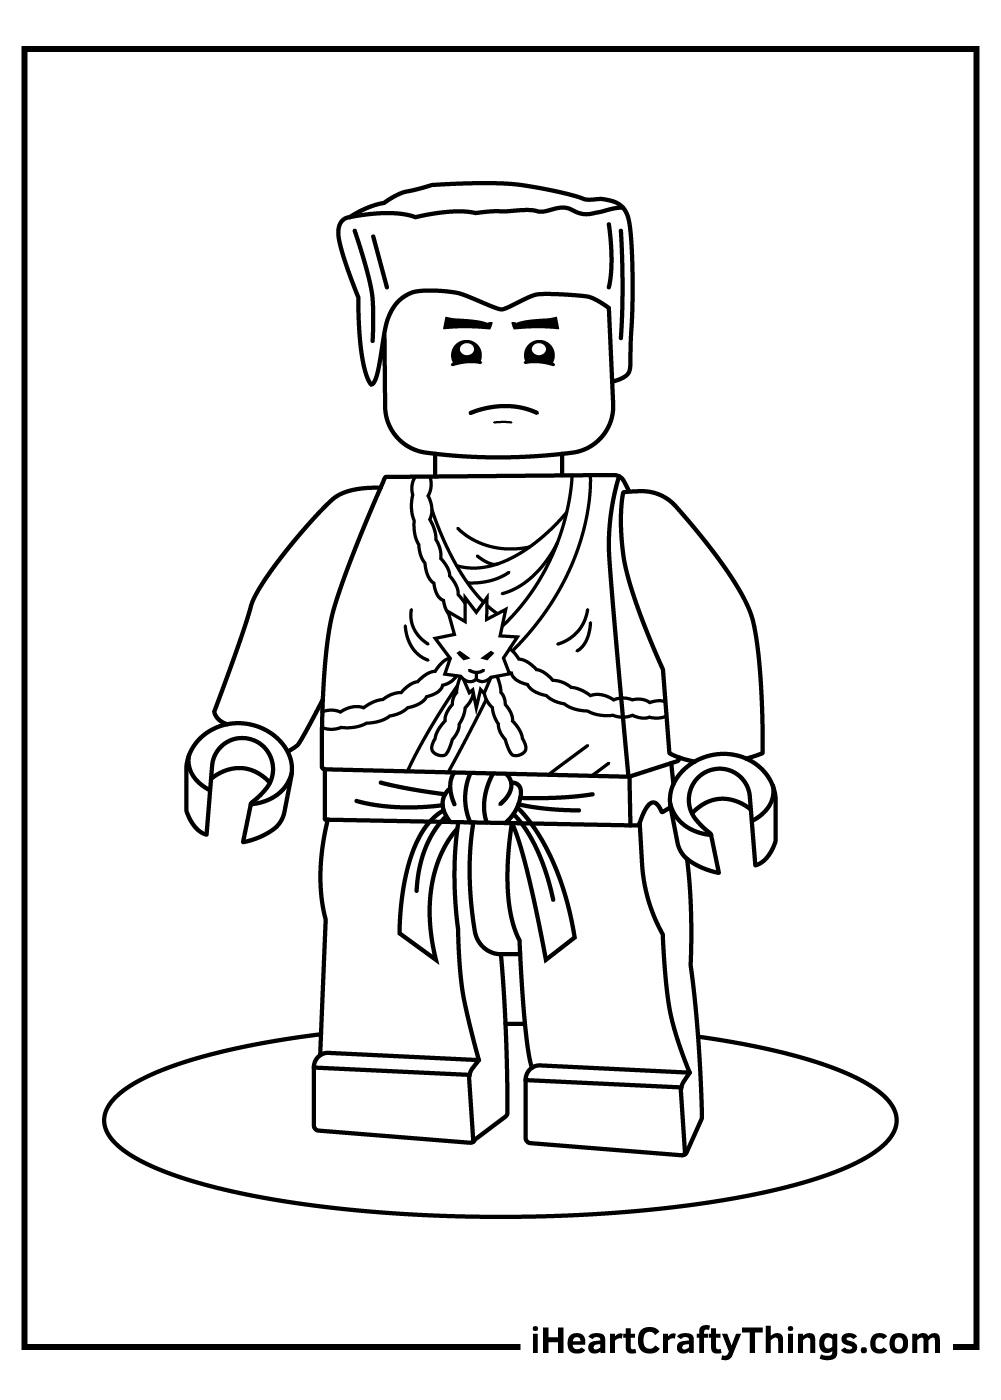 lego ninjago coloring pages kai zx